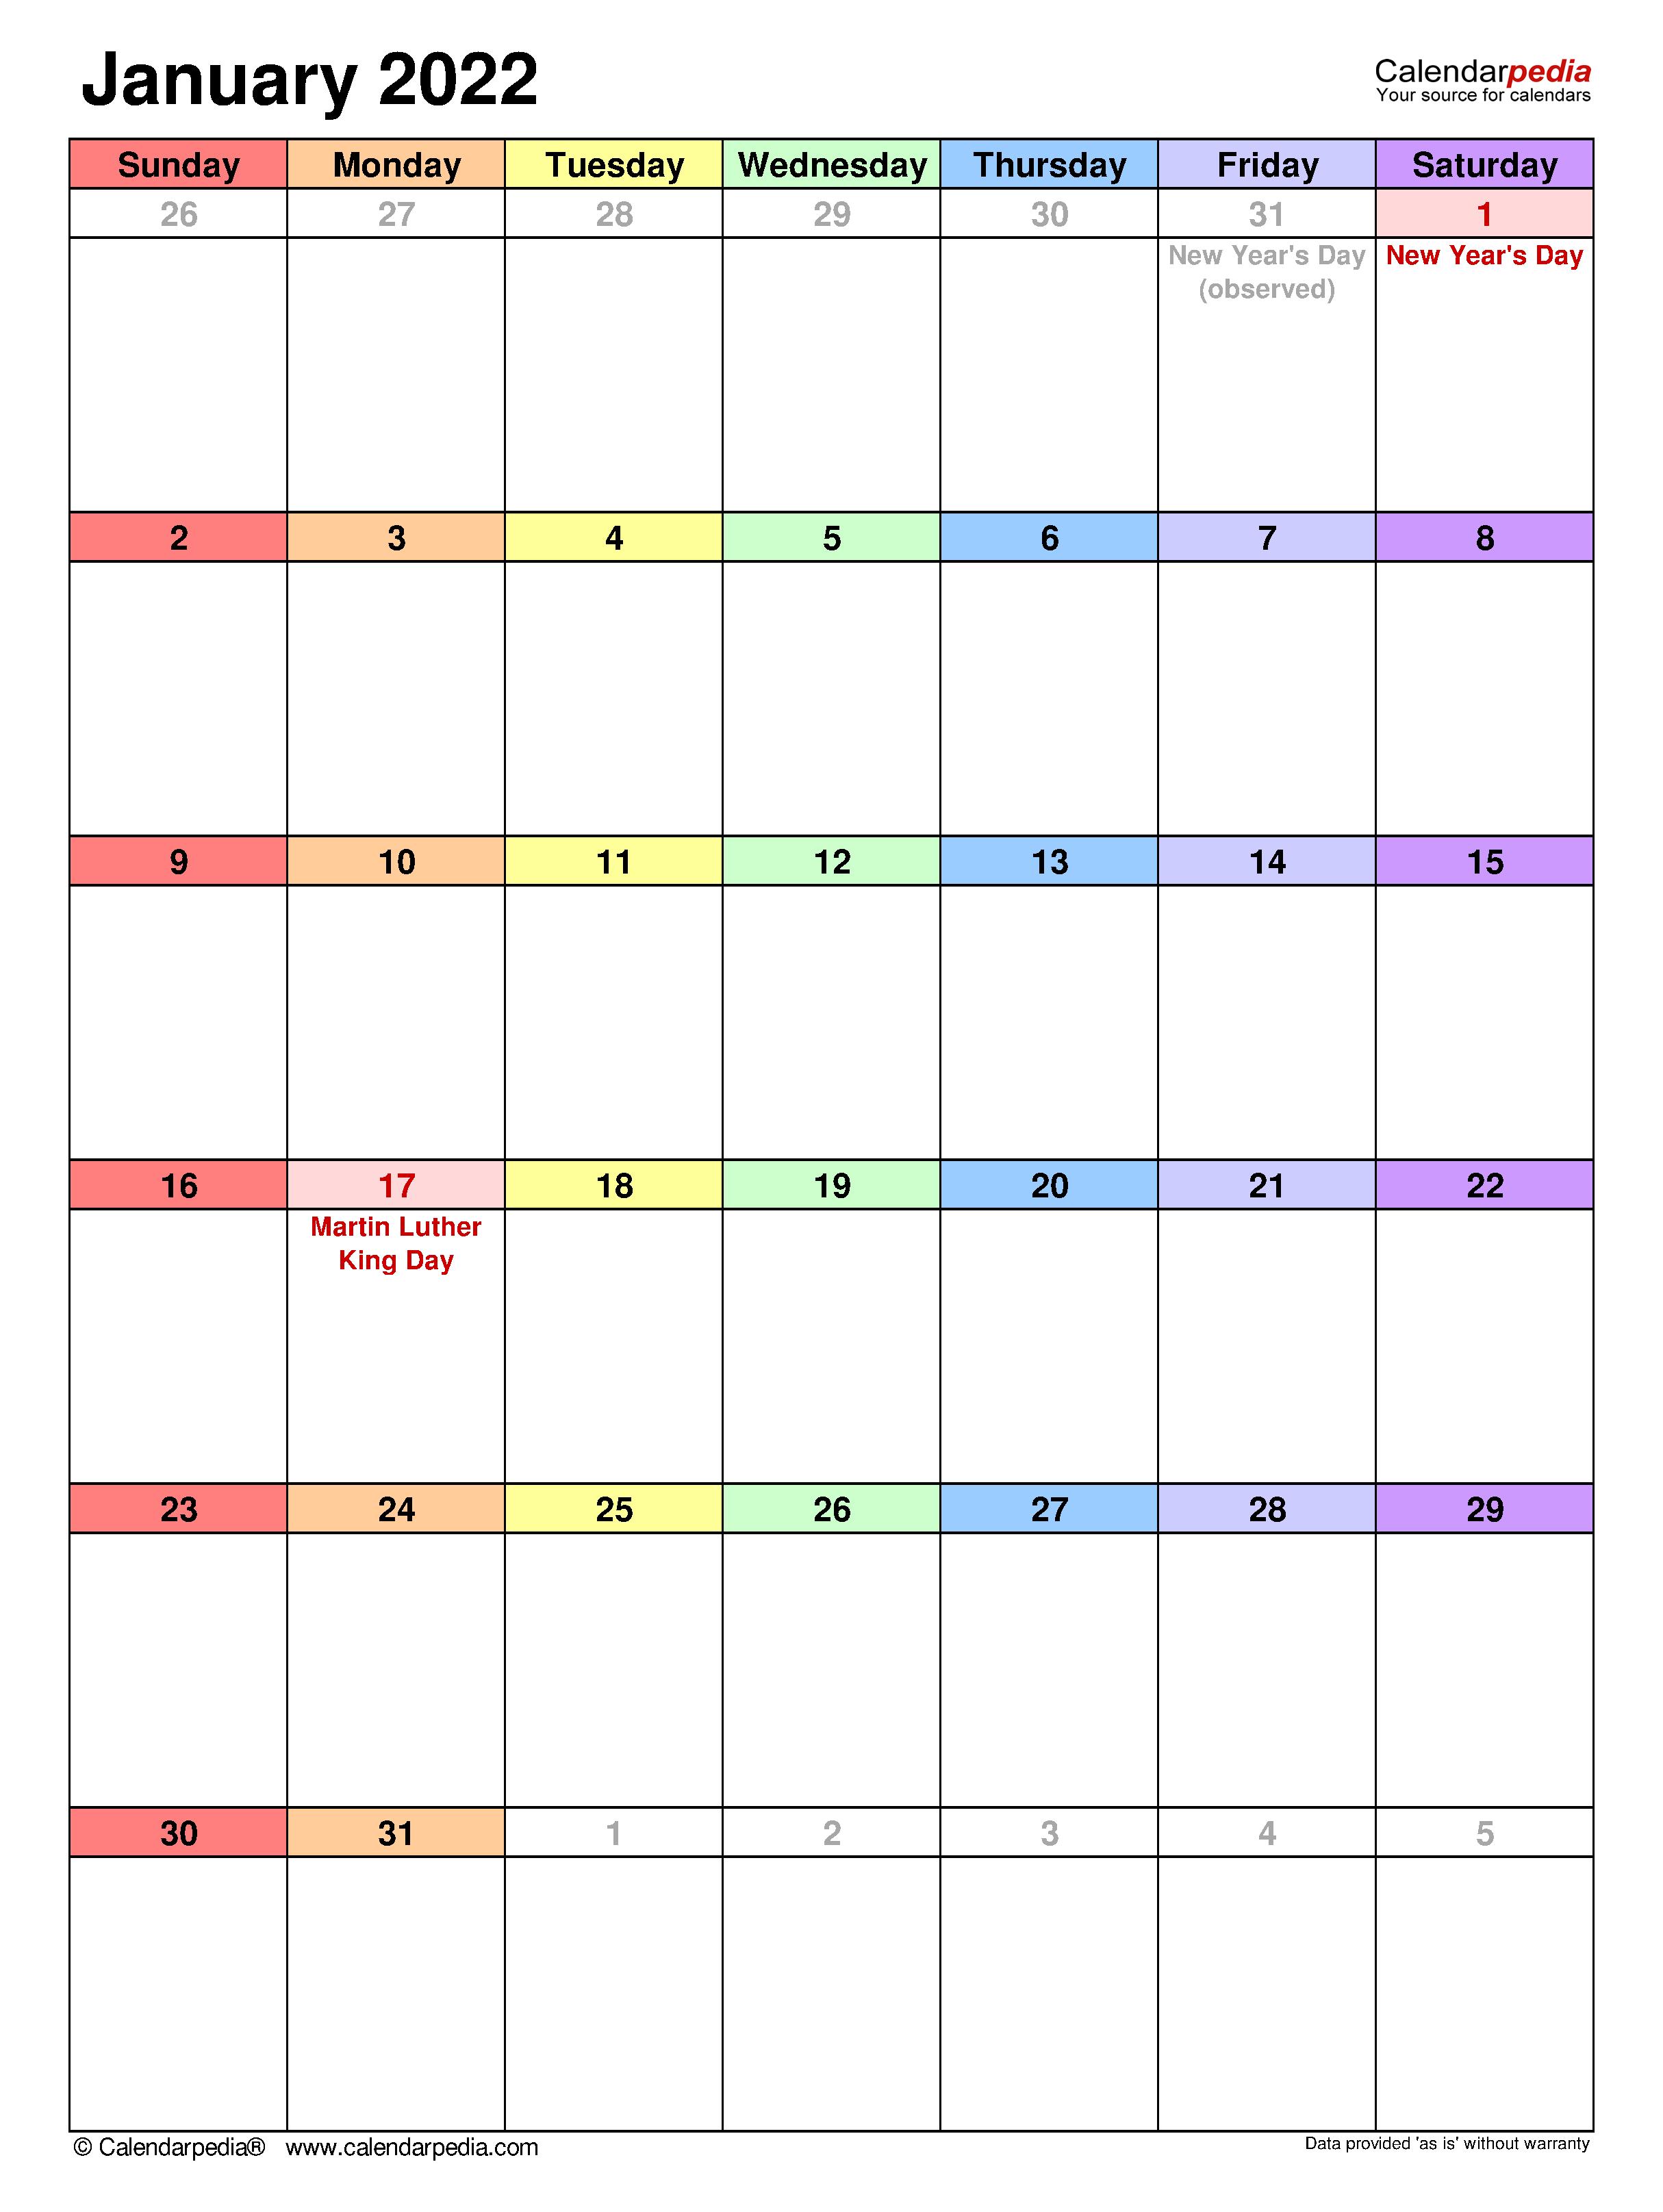 Printable January 2022 Calendar Pdf.January 2022 Calendar Templates For Word Excel And Pdf